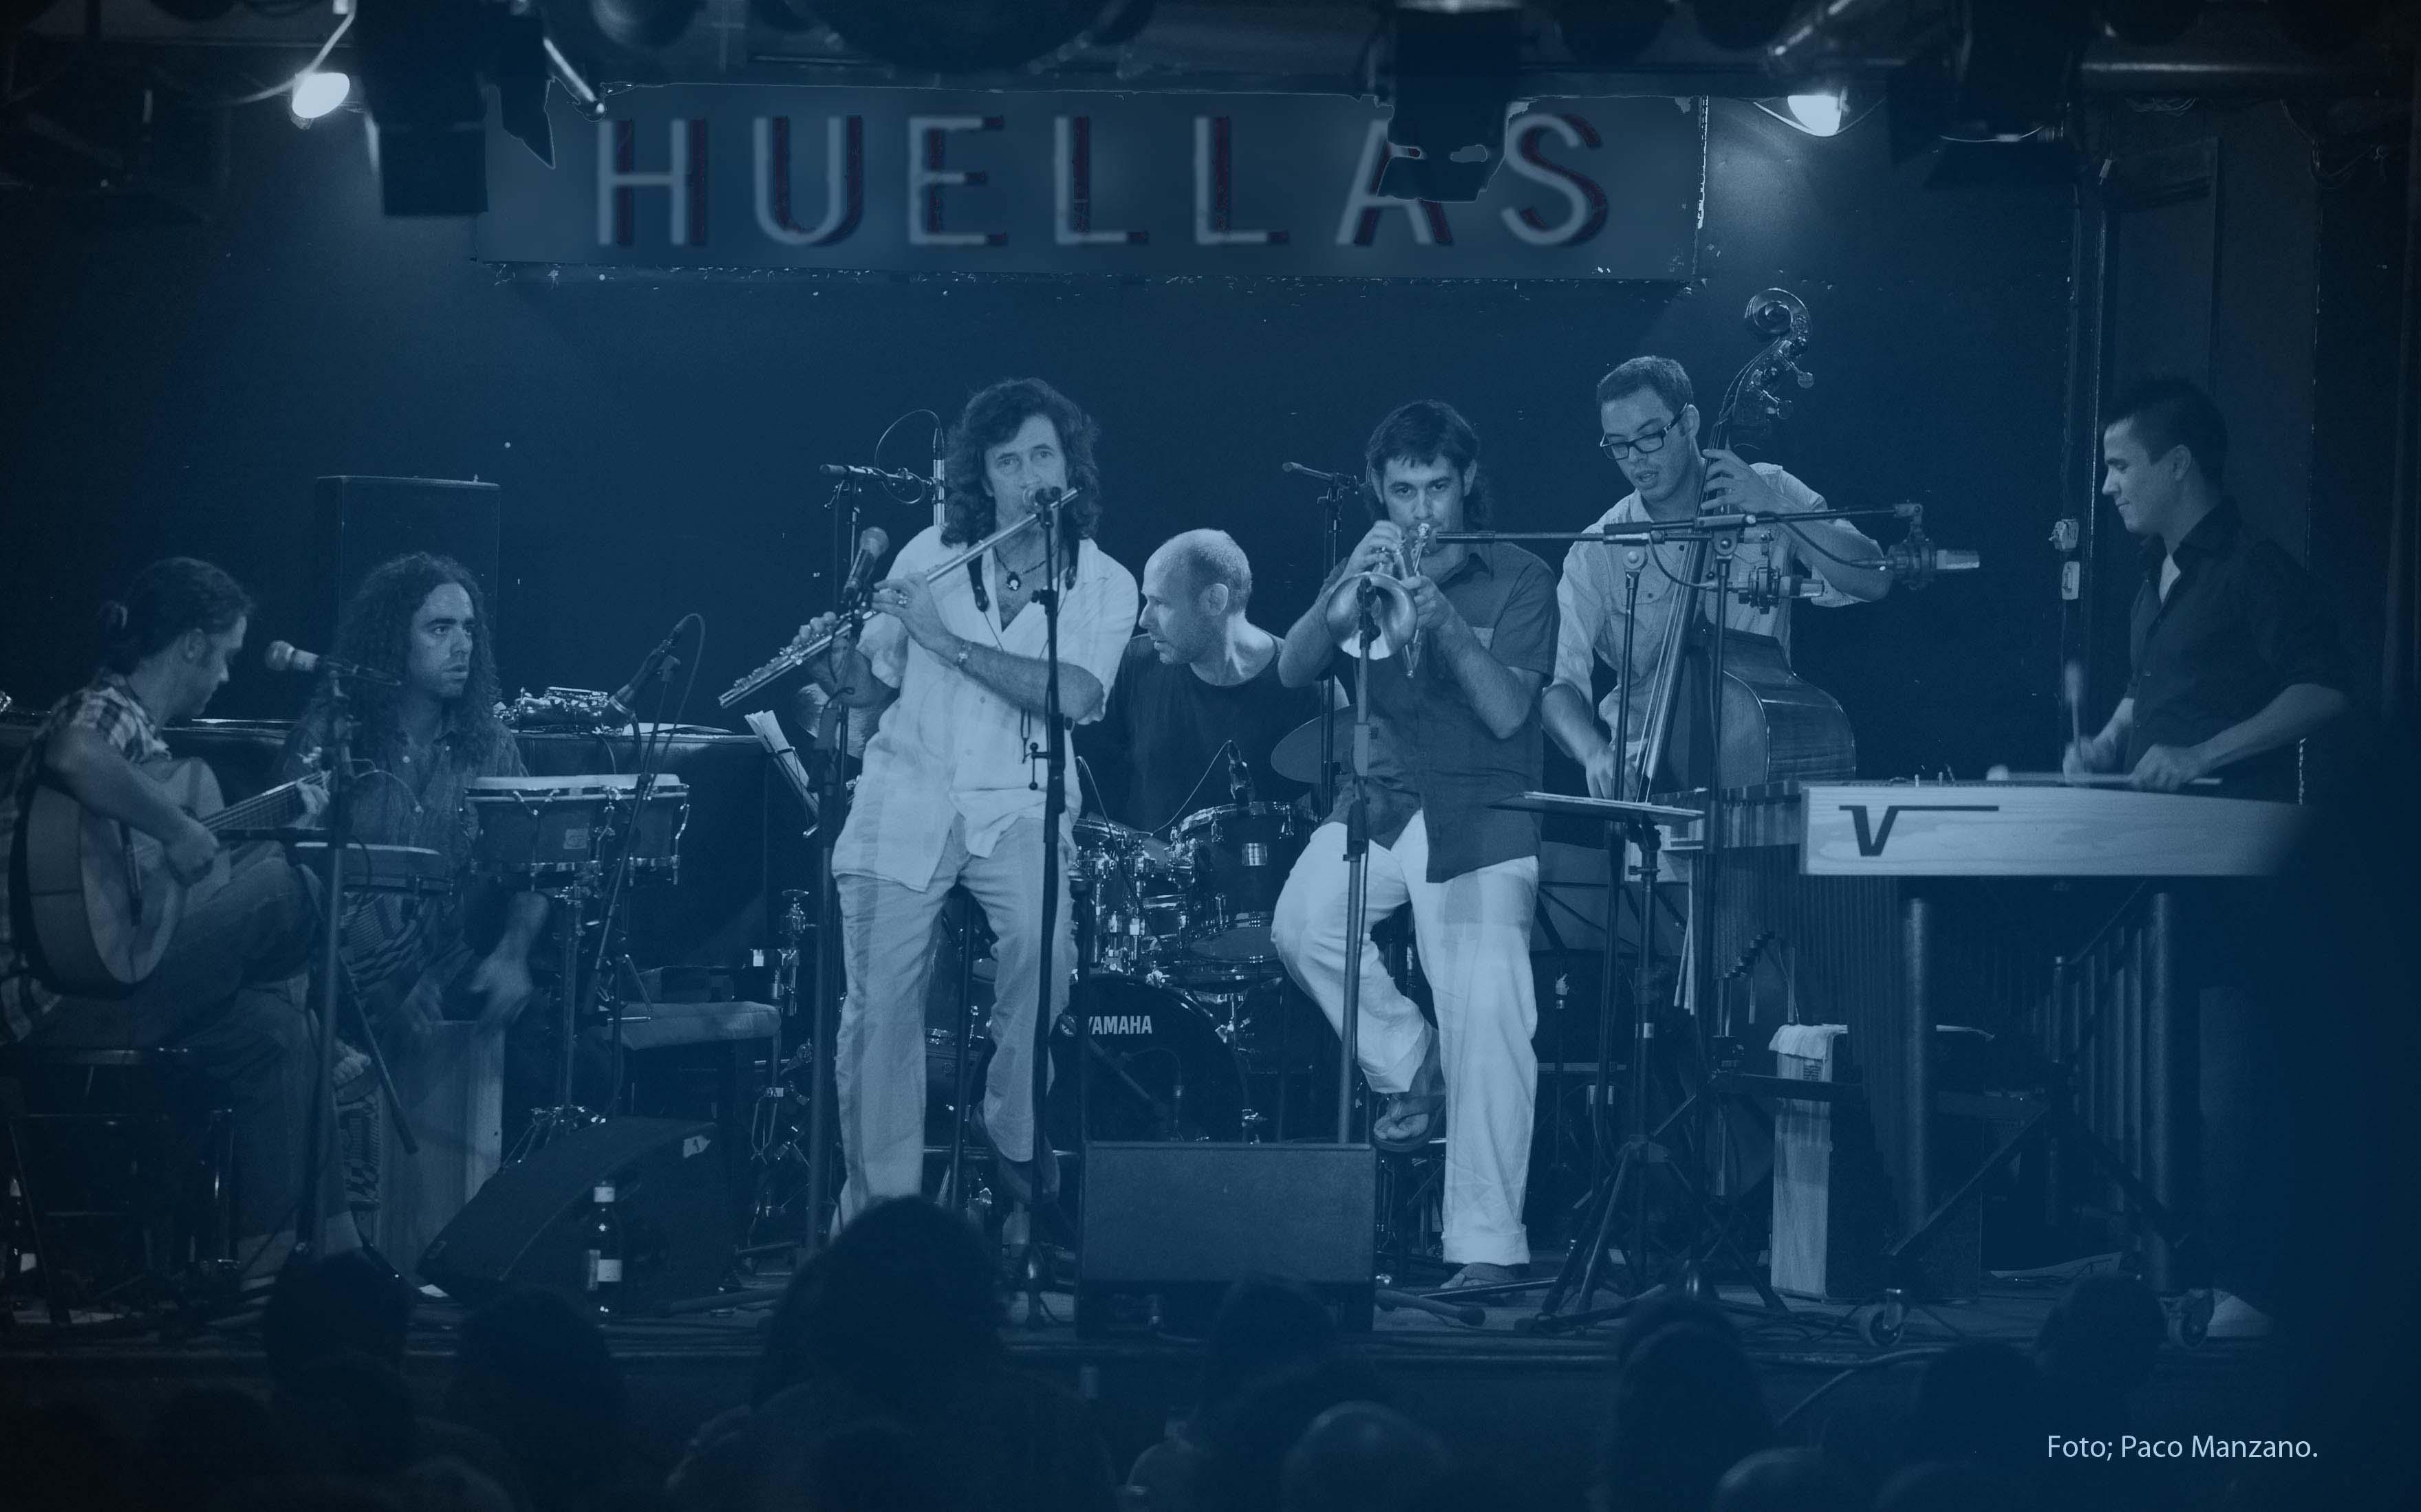 Jorge Pardo, flauta, saxo, flamenco, jazz, musica en vivo, España, guitarra flamenca, Paco de Lucia, Camaron, flamenco jam, groove, musica electronica, metaflamenco, Huellas, Huellas XXL, nuevo CD, Josemi Carmona, Bandolero, Jeff Ballard, exoflamenco, Diego Guerrero, Enriquito